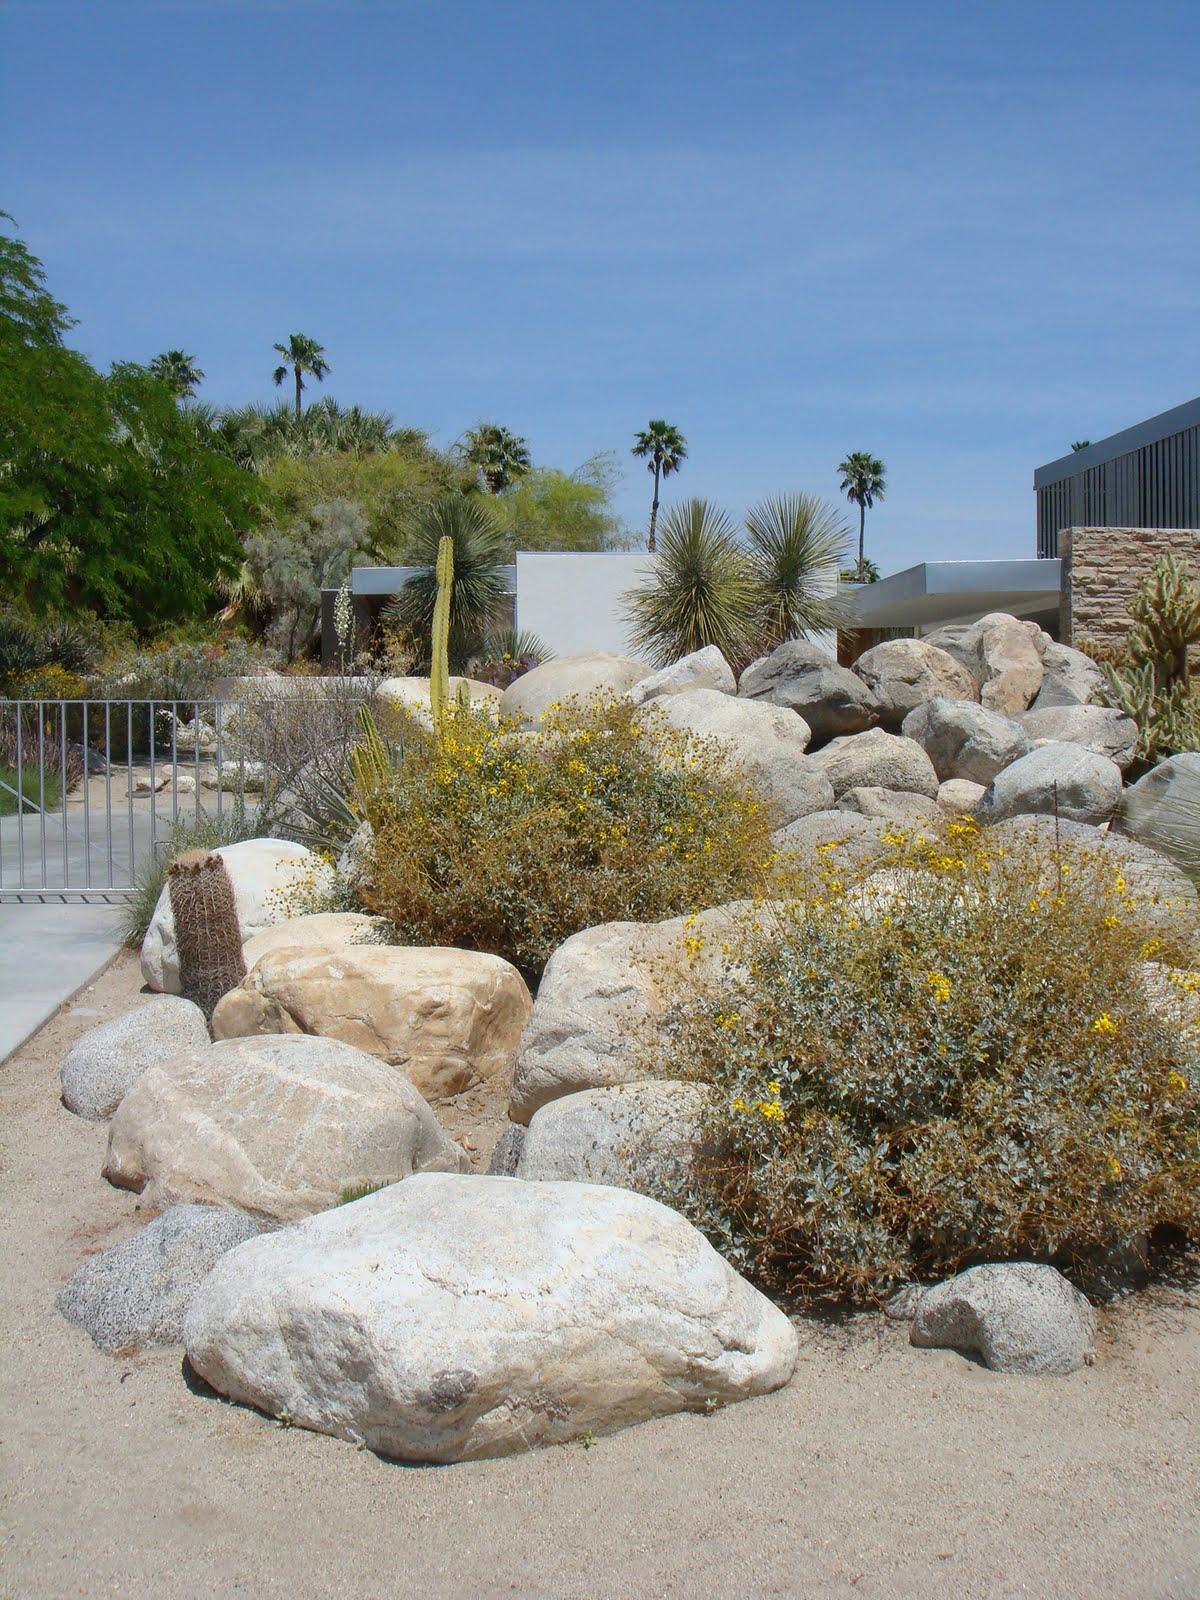 Desert landscaping s kaufmann house in palm springs credit nova68 com